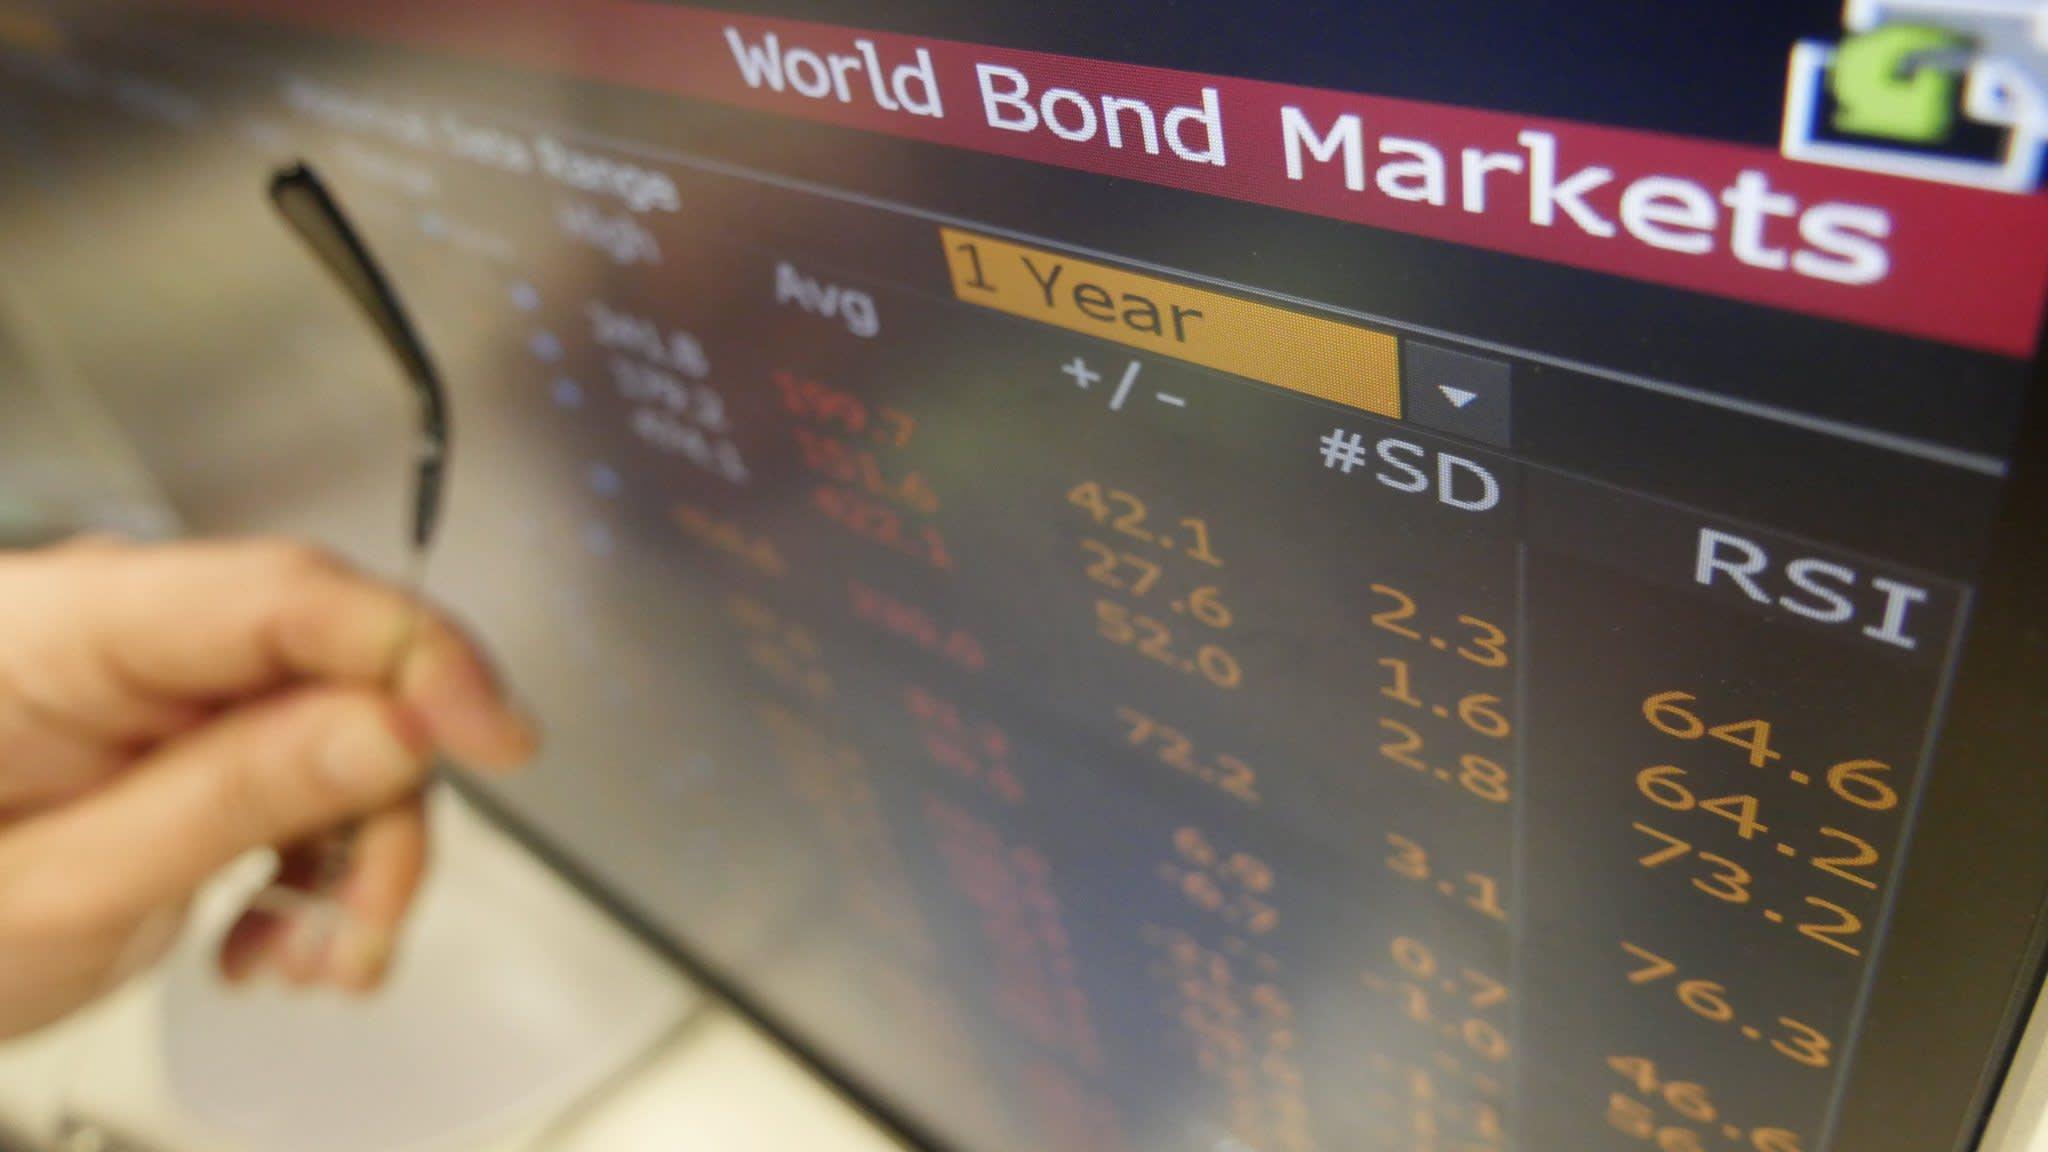 Investors signal concern over corporate credit market